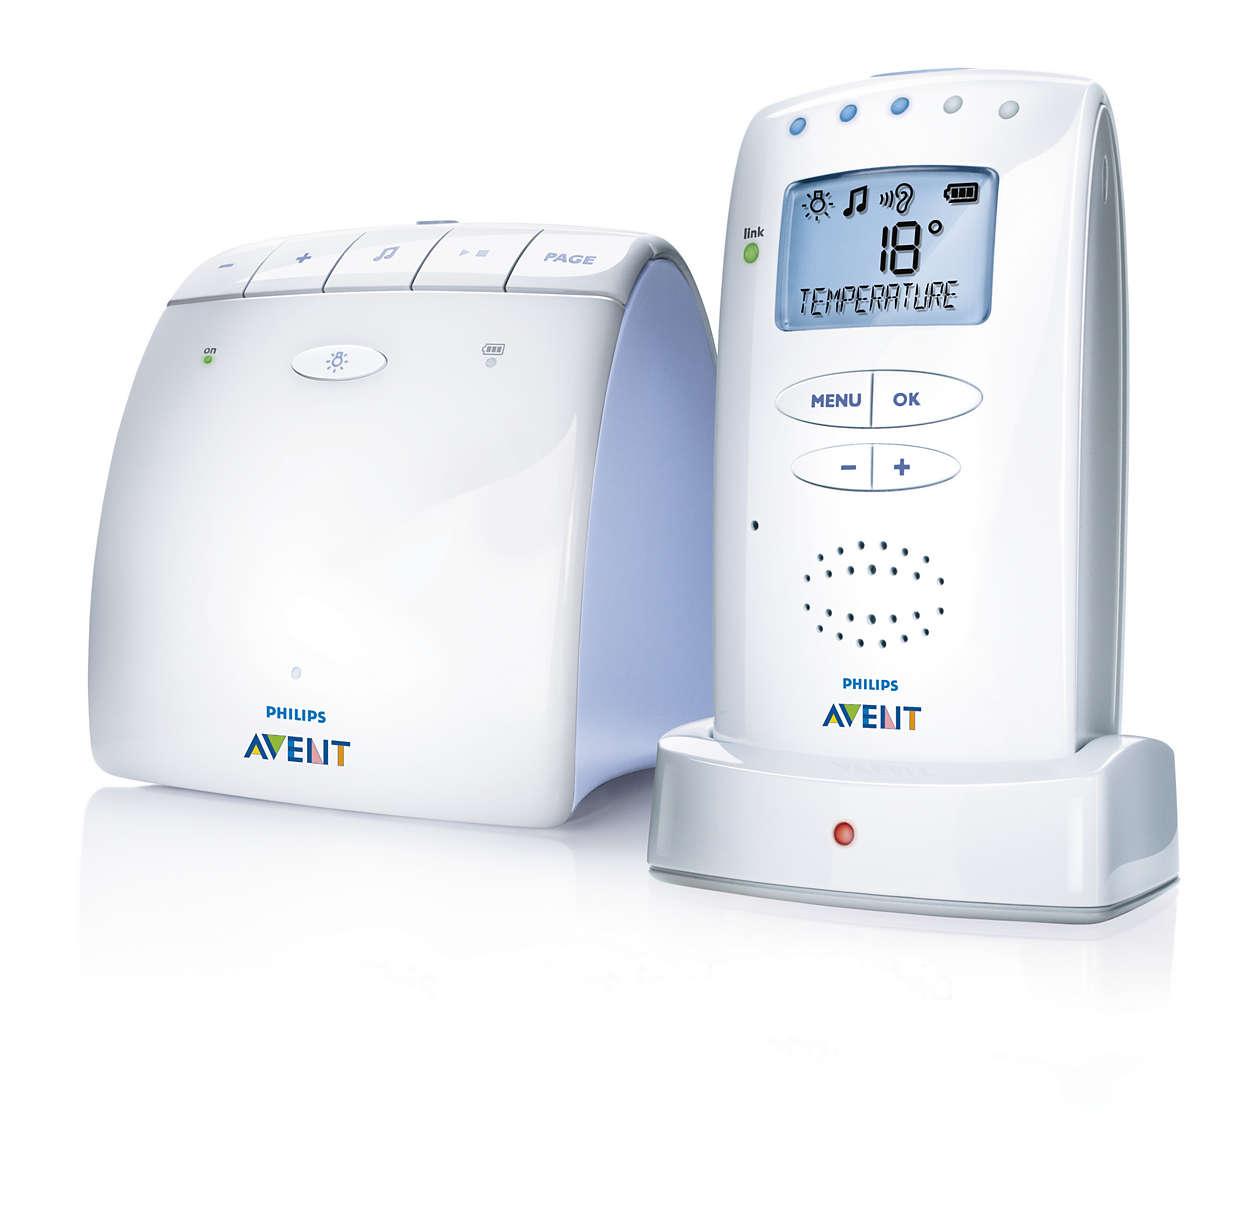 Odpowiednia temperatura i pełen komfort